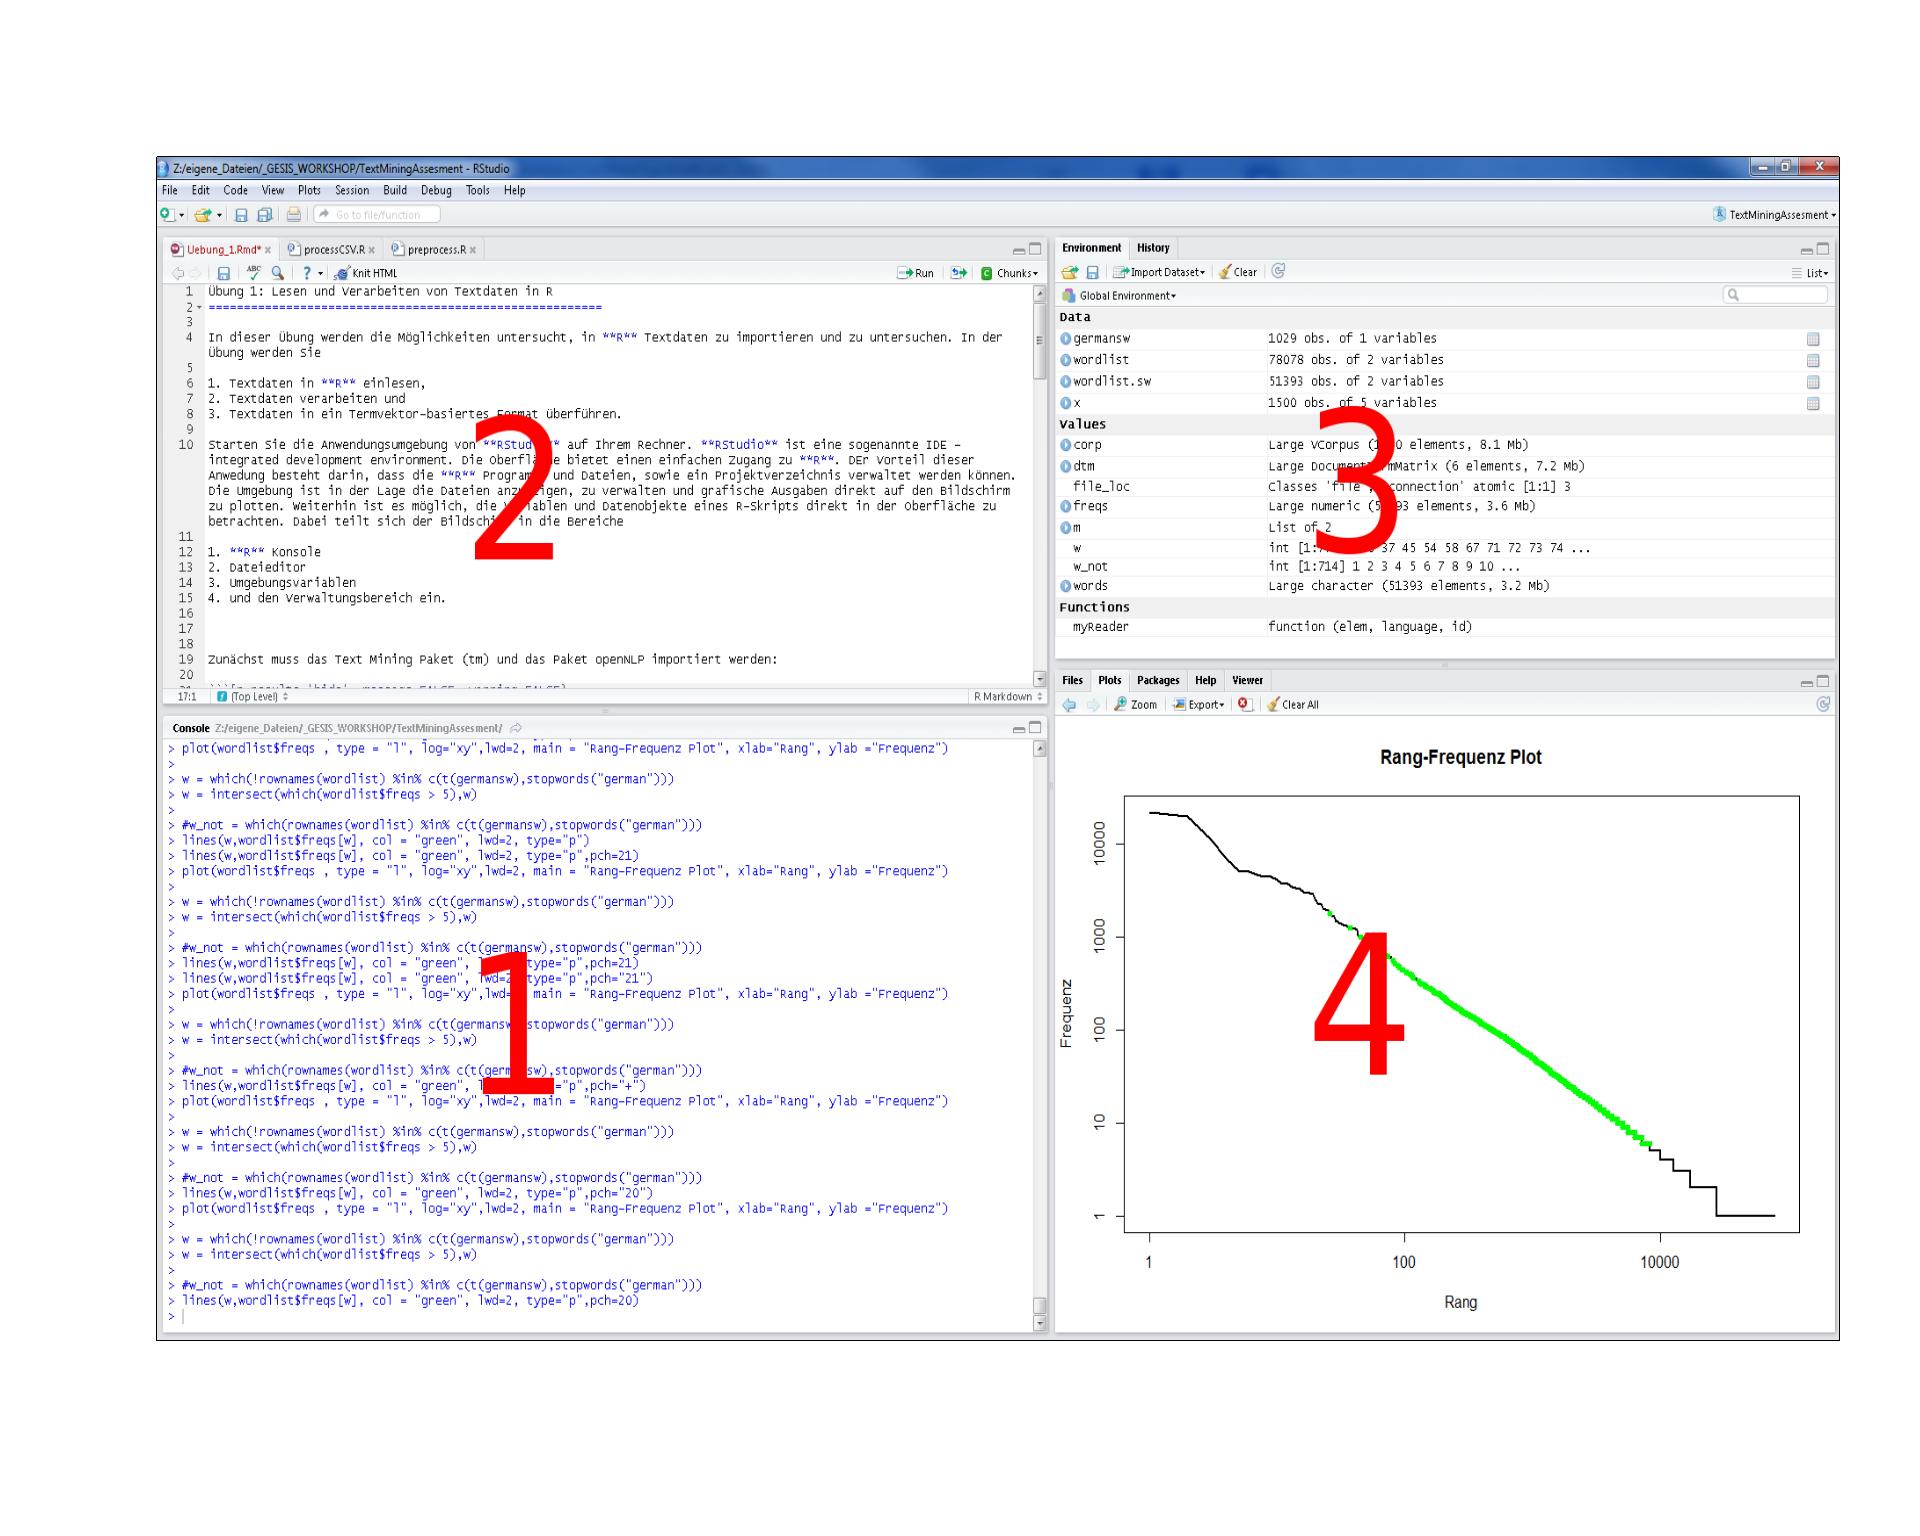 Tutorial 0: R Basic functions